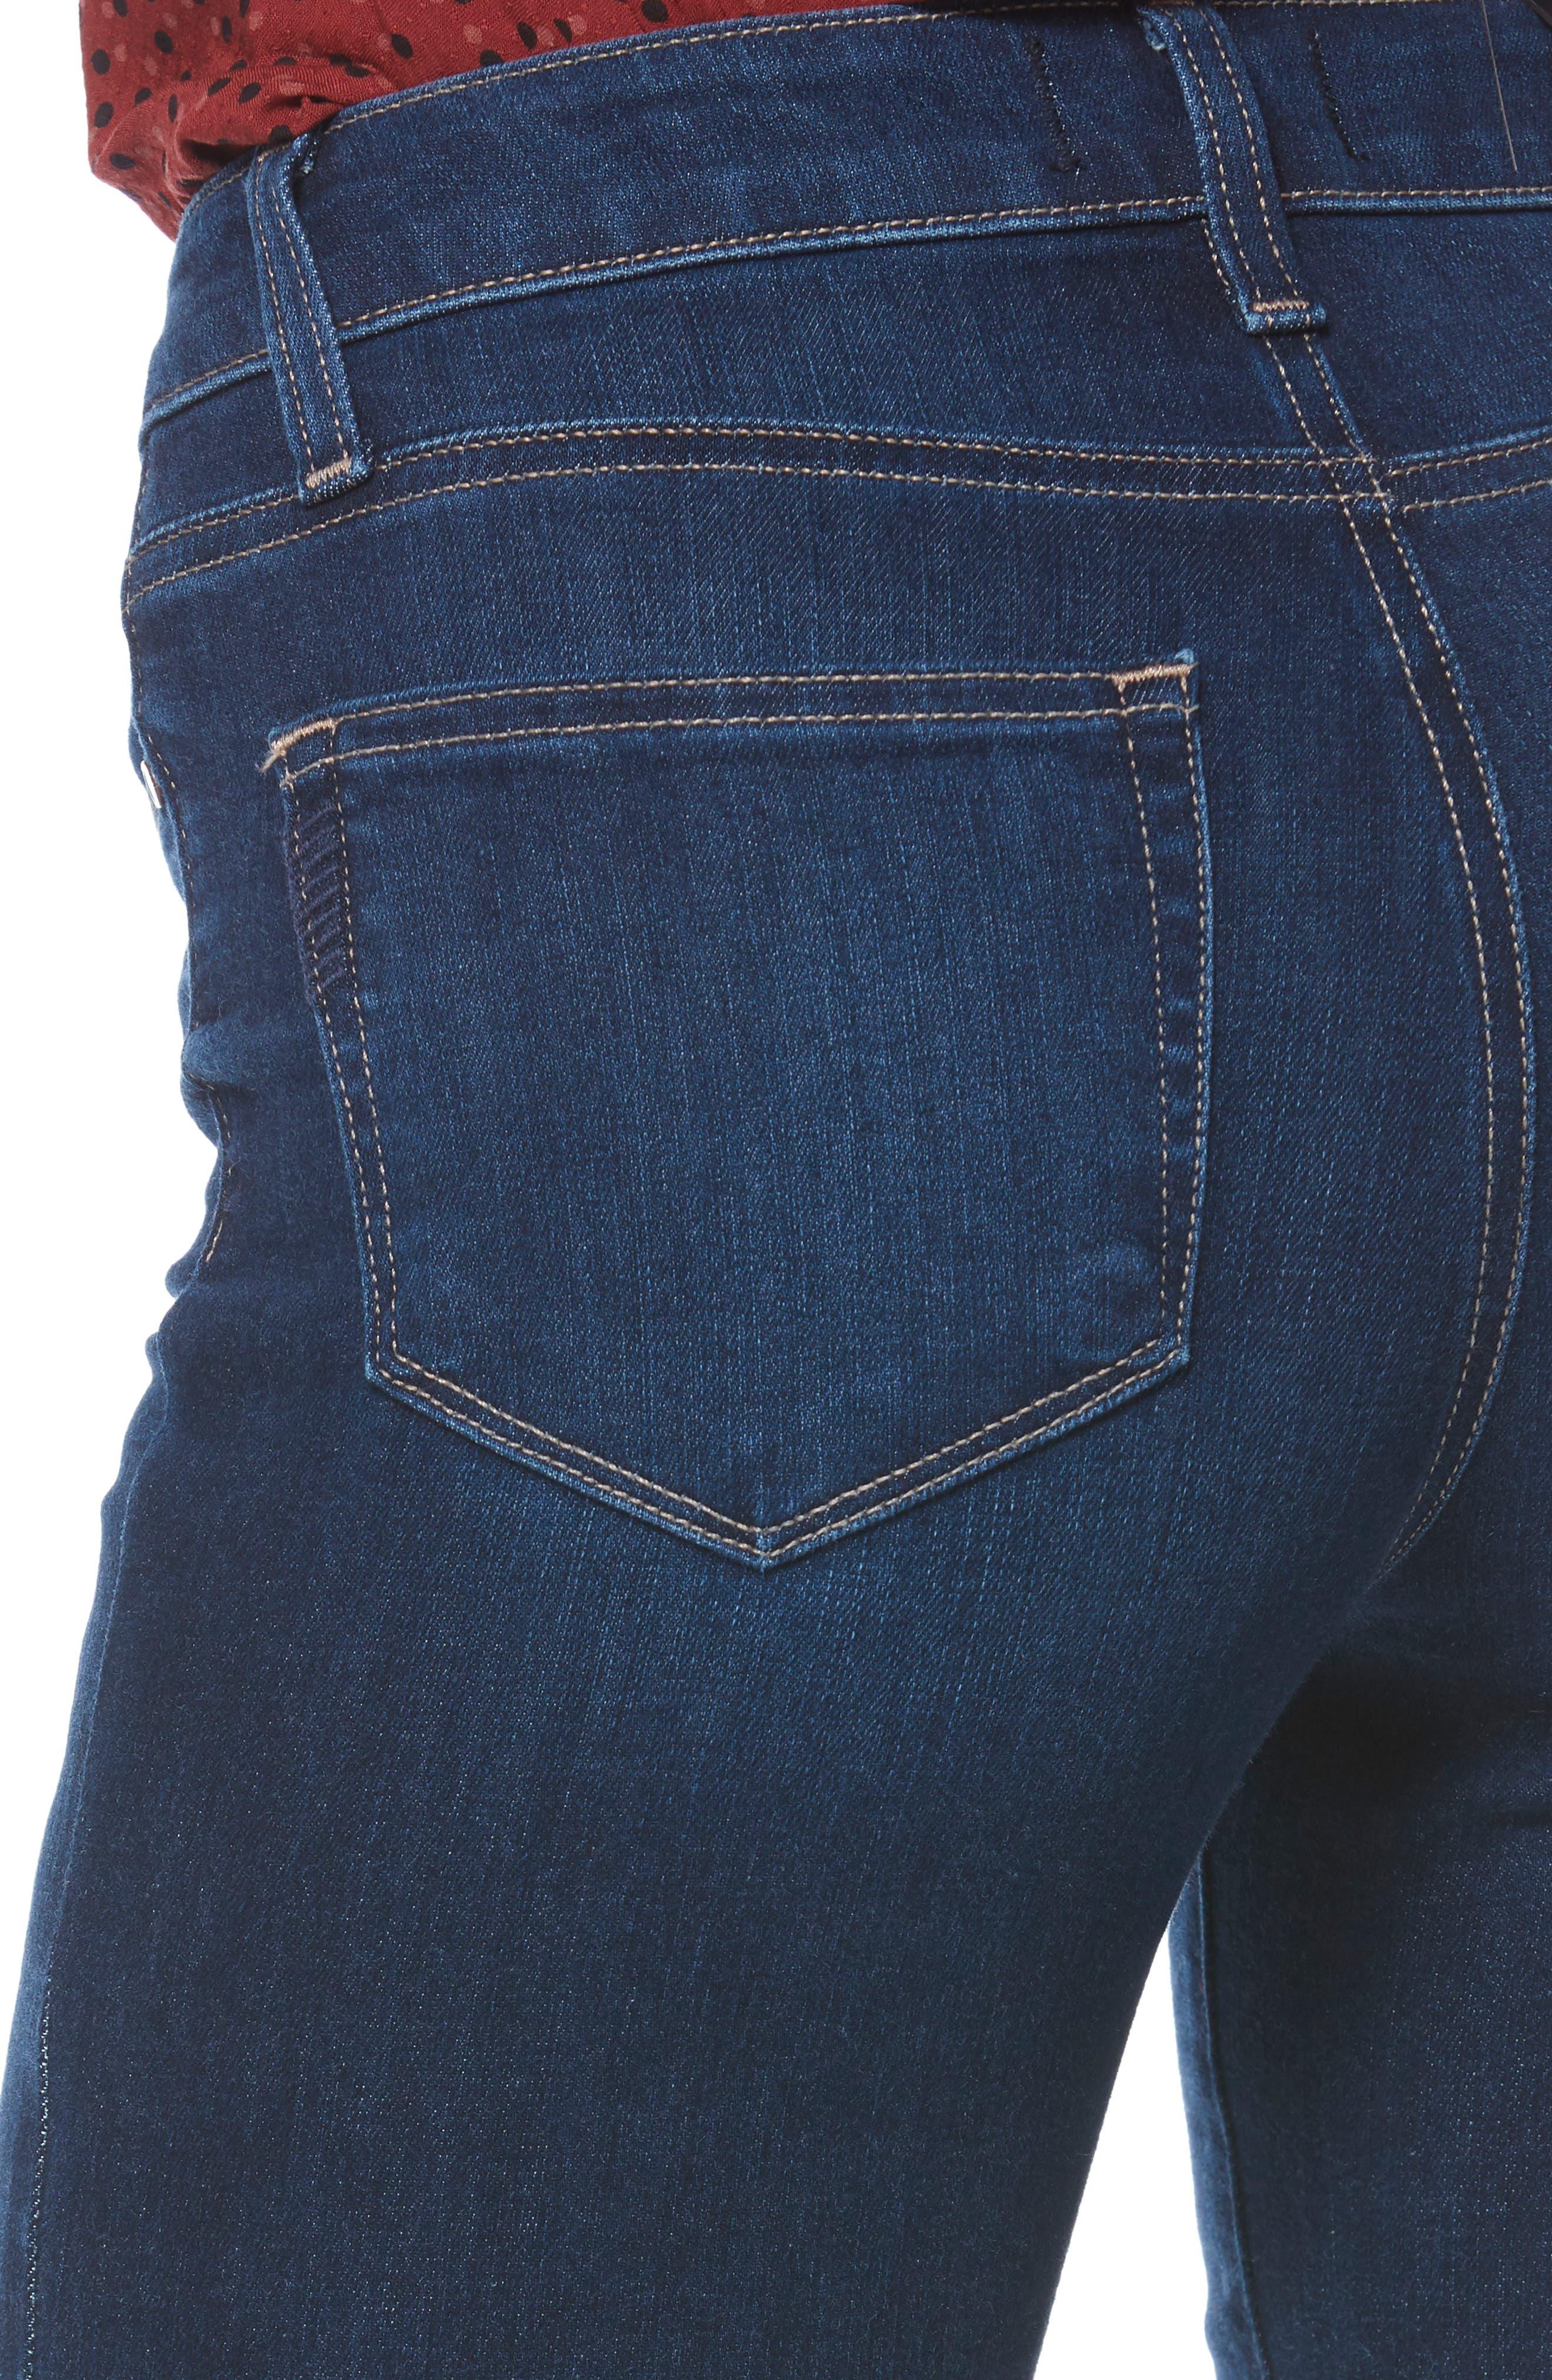 Transcend Vintage - Manhattan Bootcut Jeans,                             Alternate thumbnail 4, color,                             POMPEII